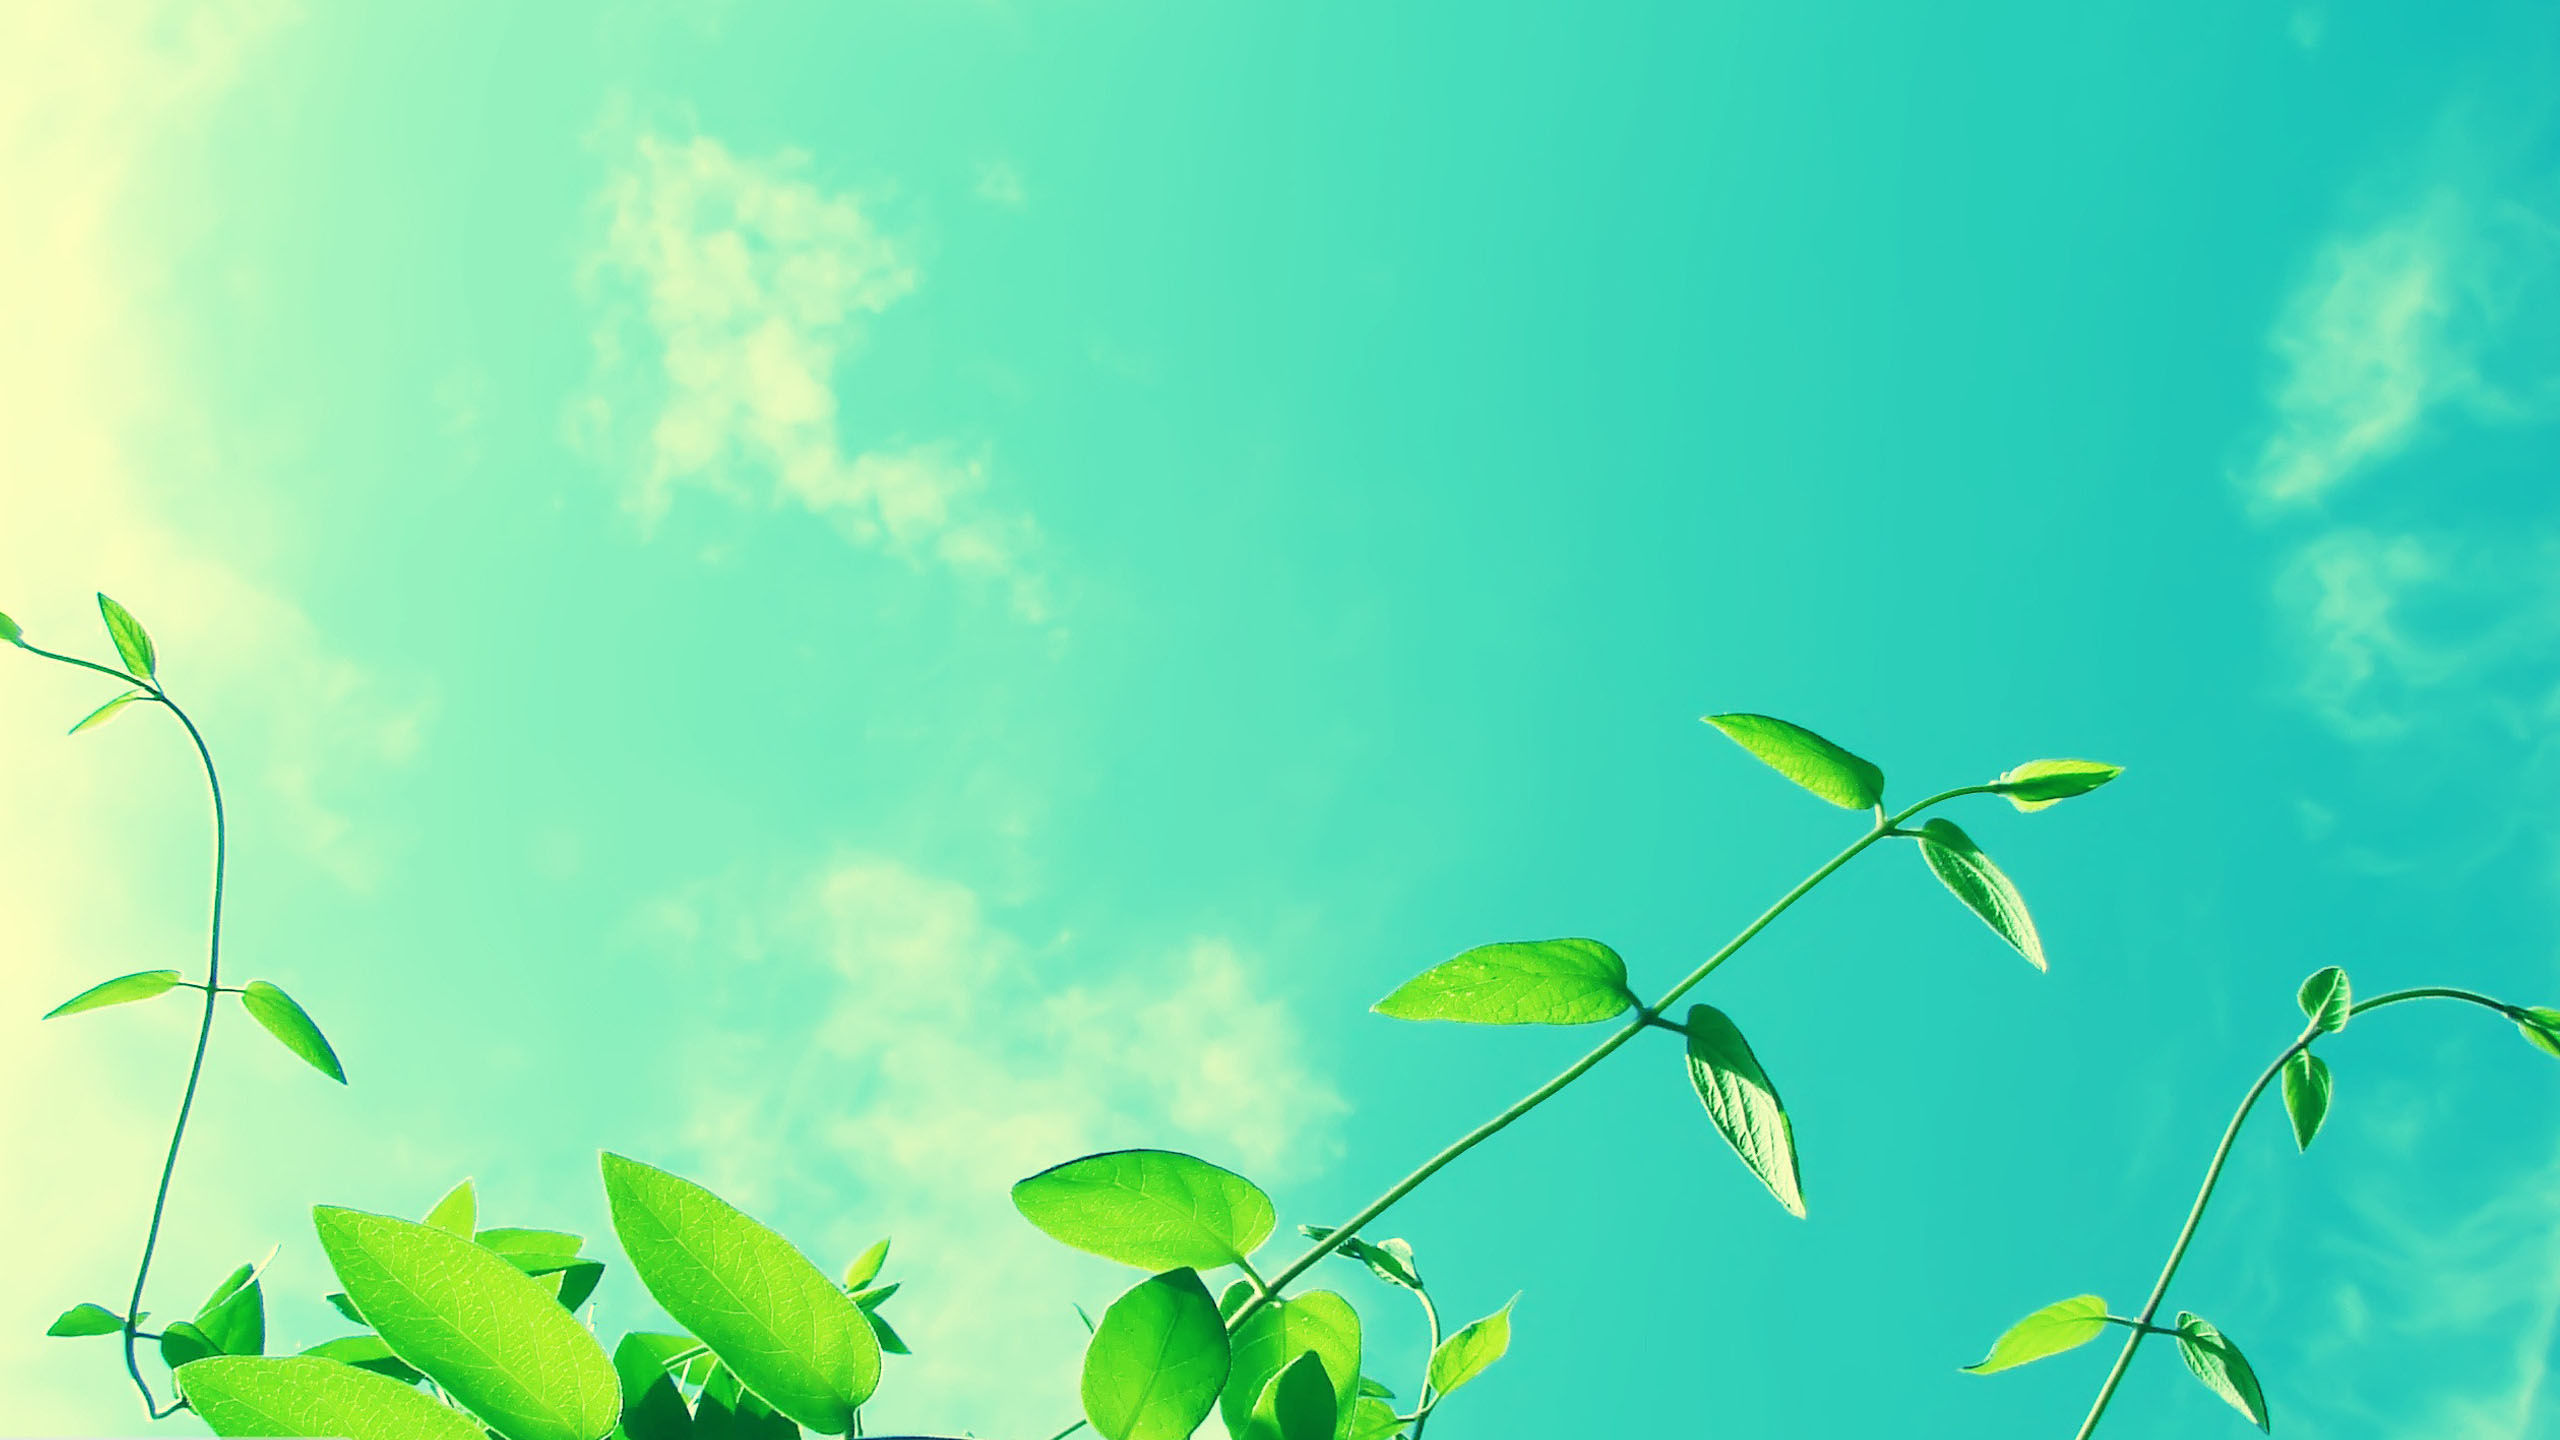 Vines And Sunny Sky Wallpaper 2560X1440jpg 2560x1440